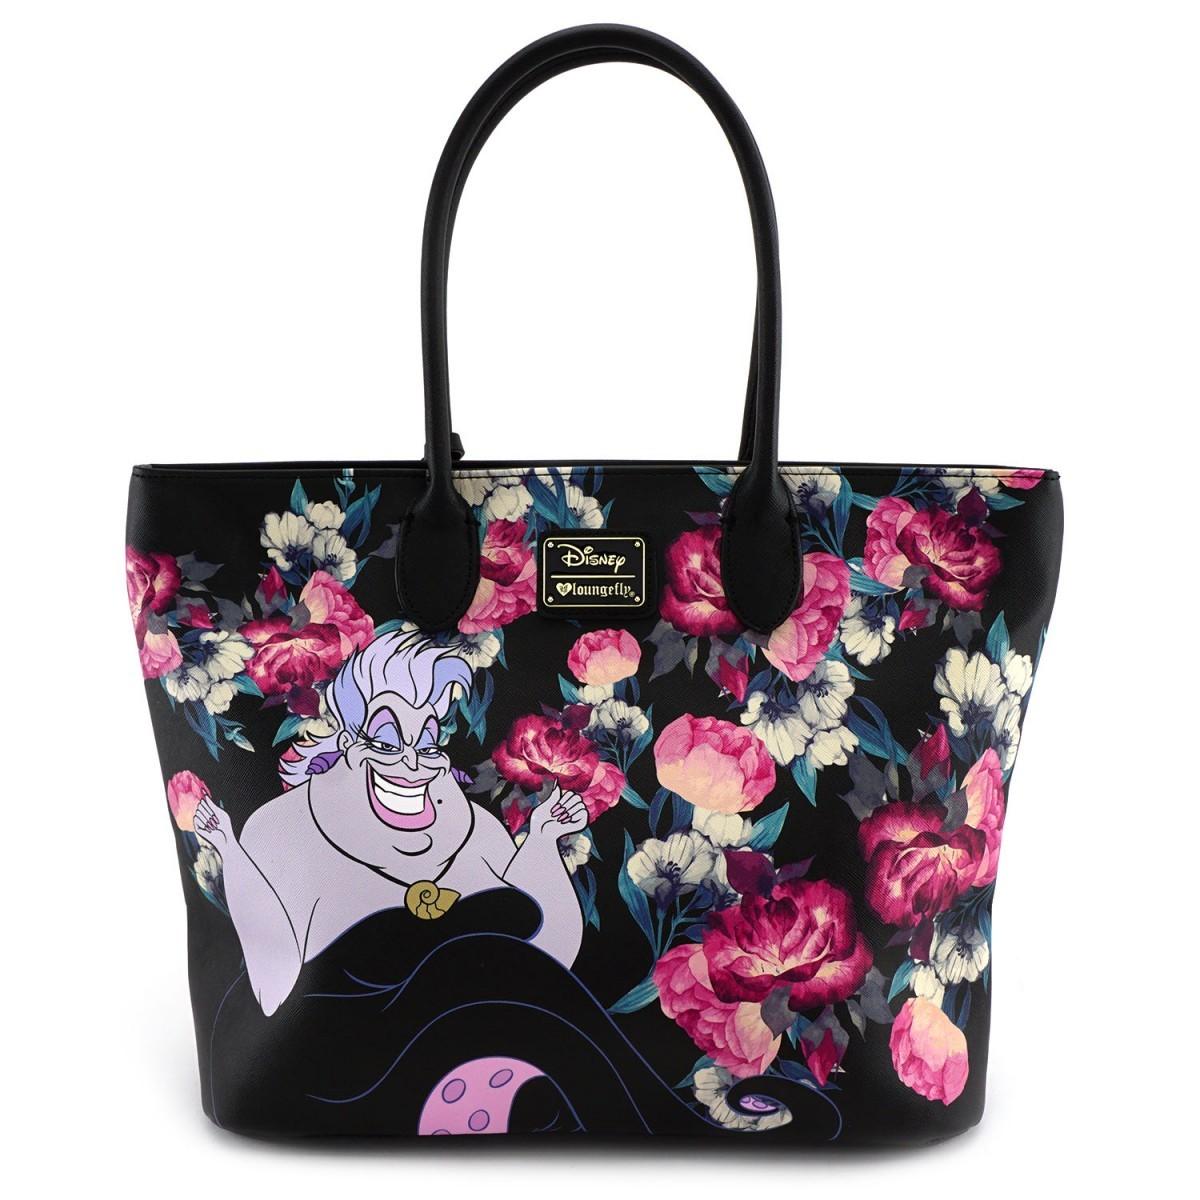 0c0e8568d54 ... Loungefly  Disney Villains - Floral Tote Bag image ...